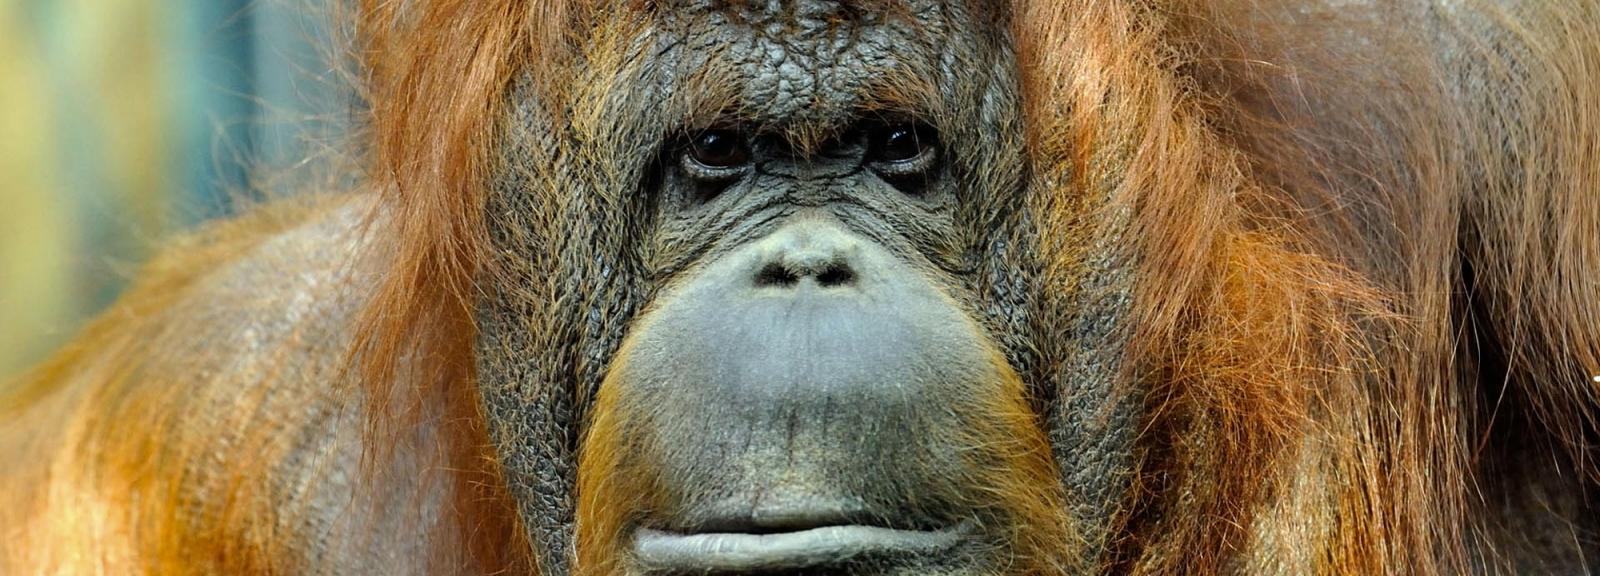 Orang-outan © MNHN - FG Grandin